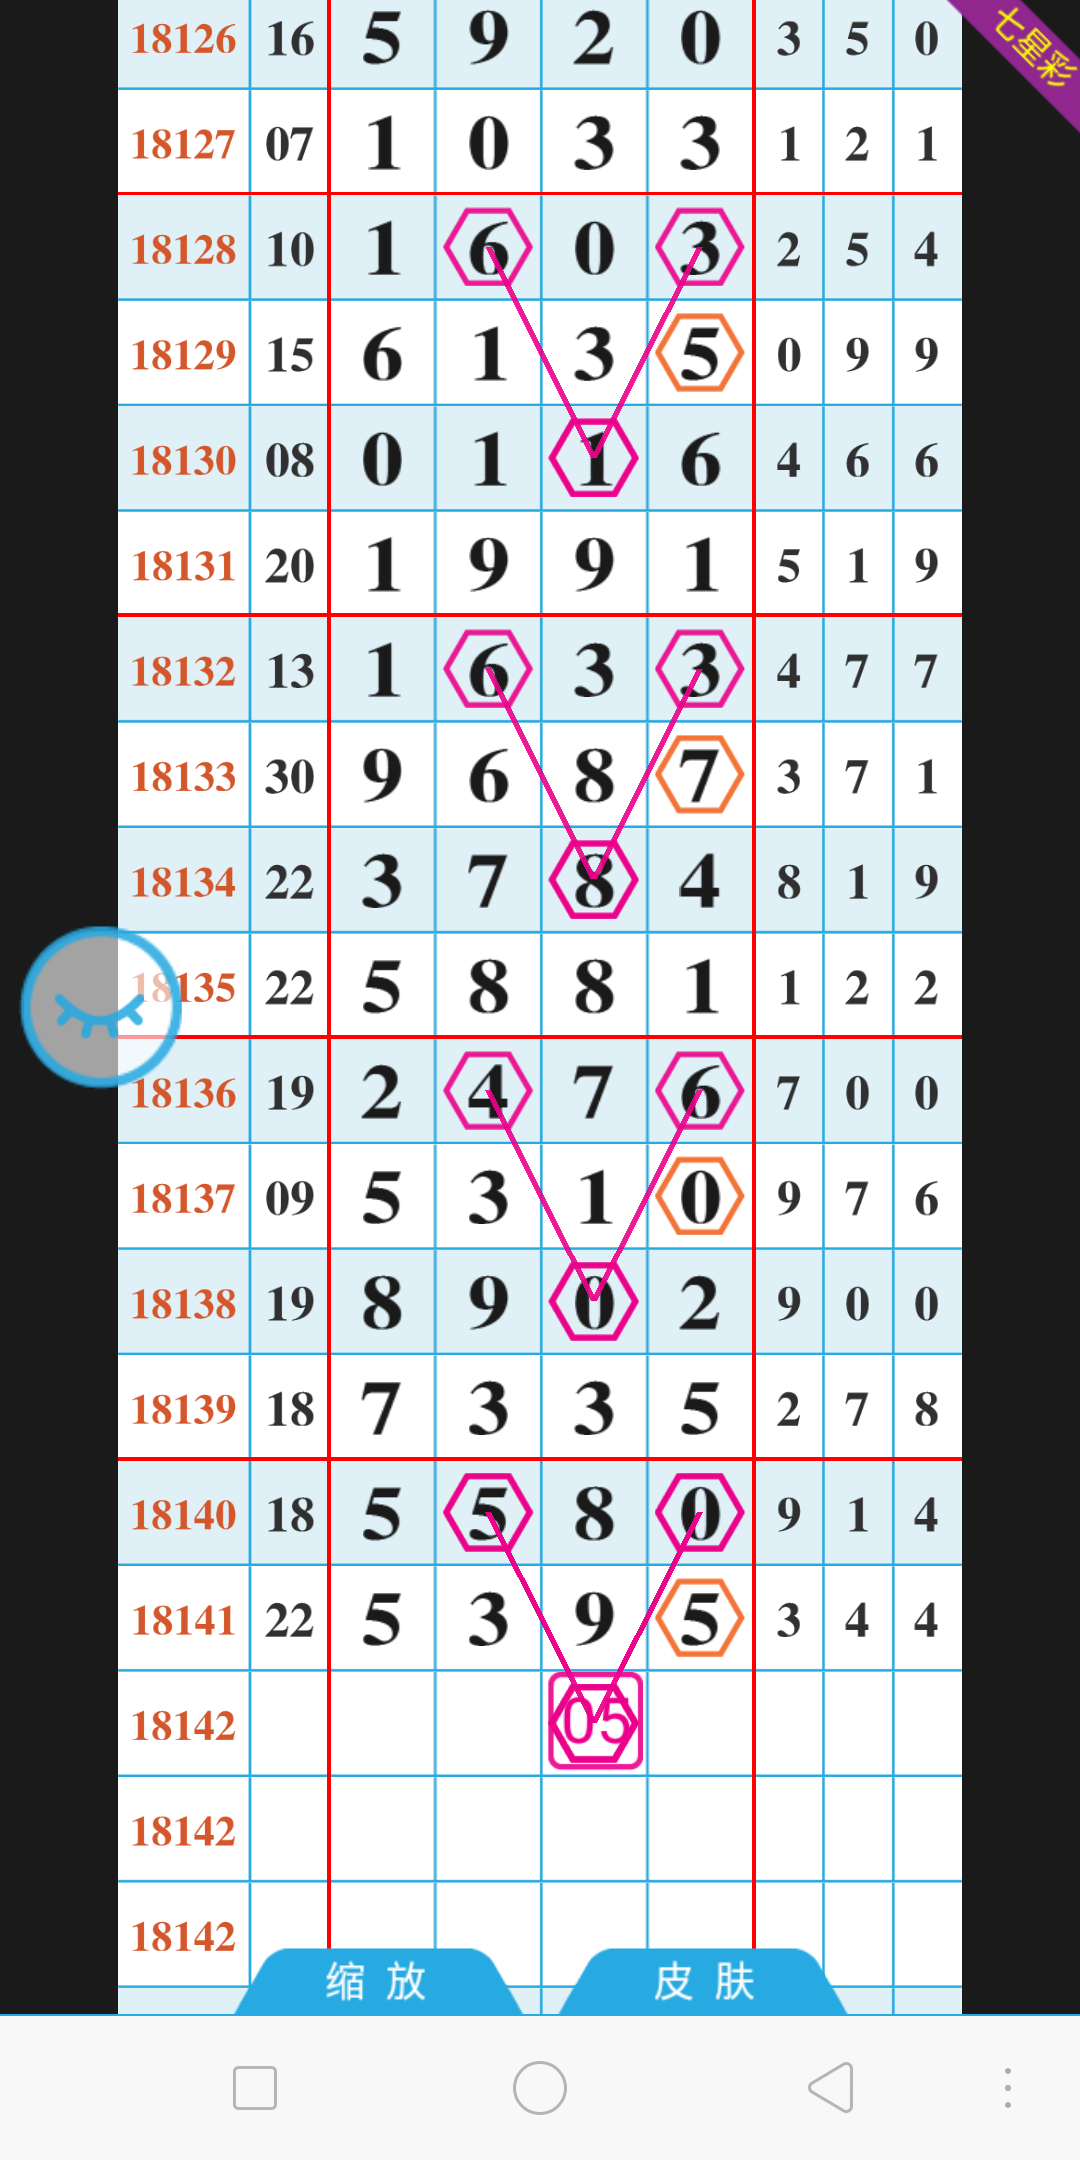 Screenshot_2018-12-03-19-05-46-34.png